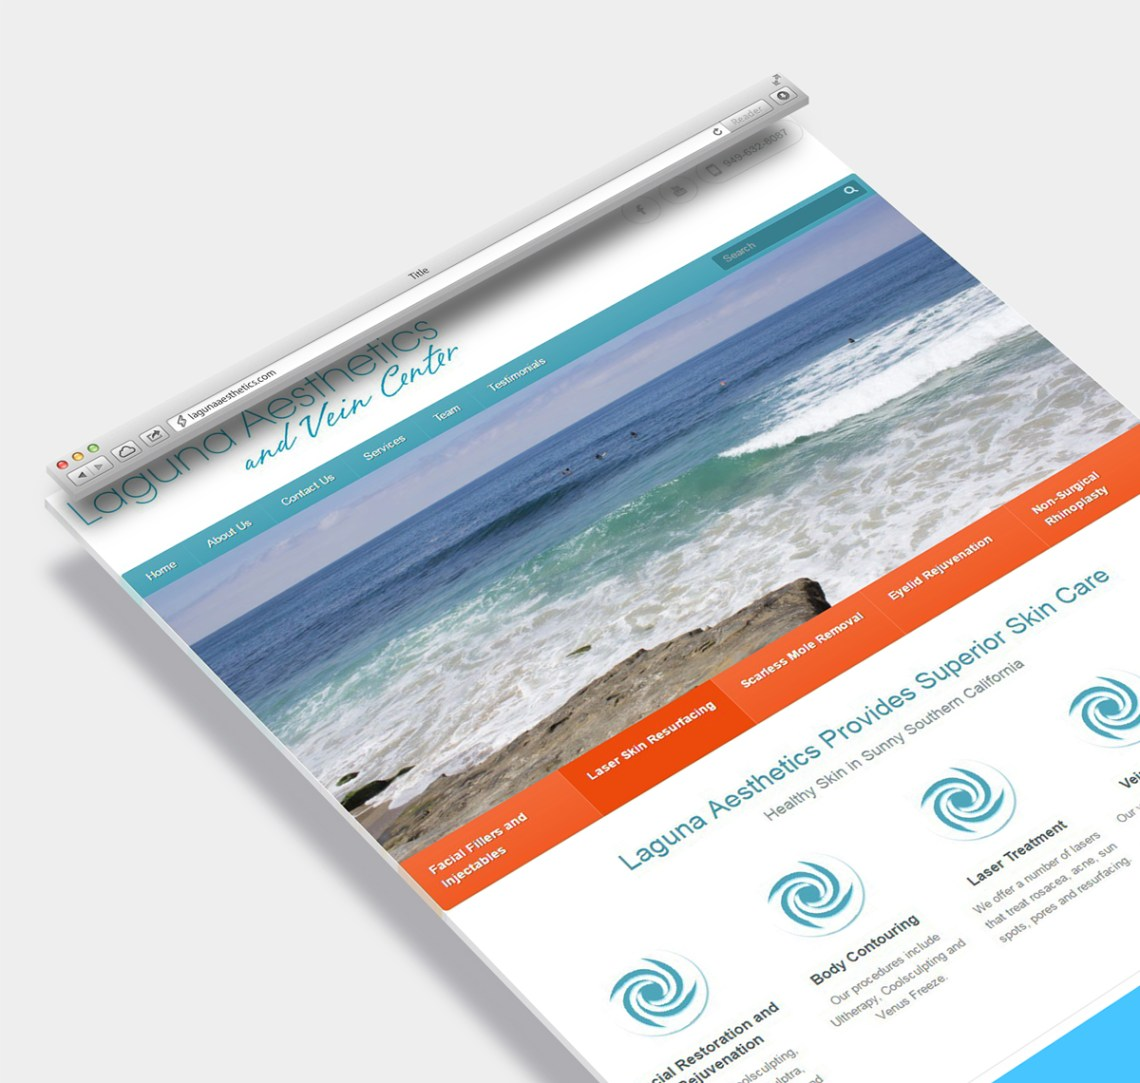 Web Design Sample for Skin Card